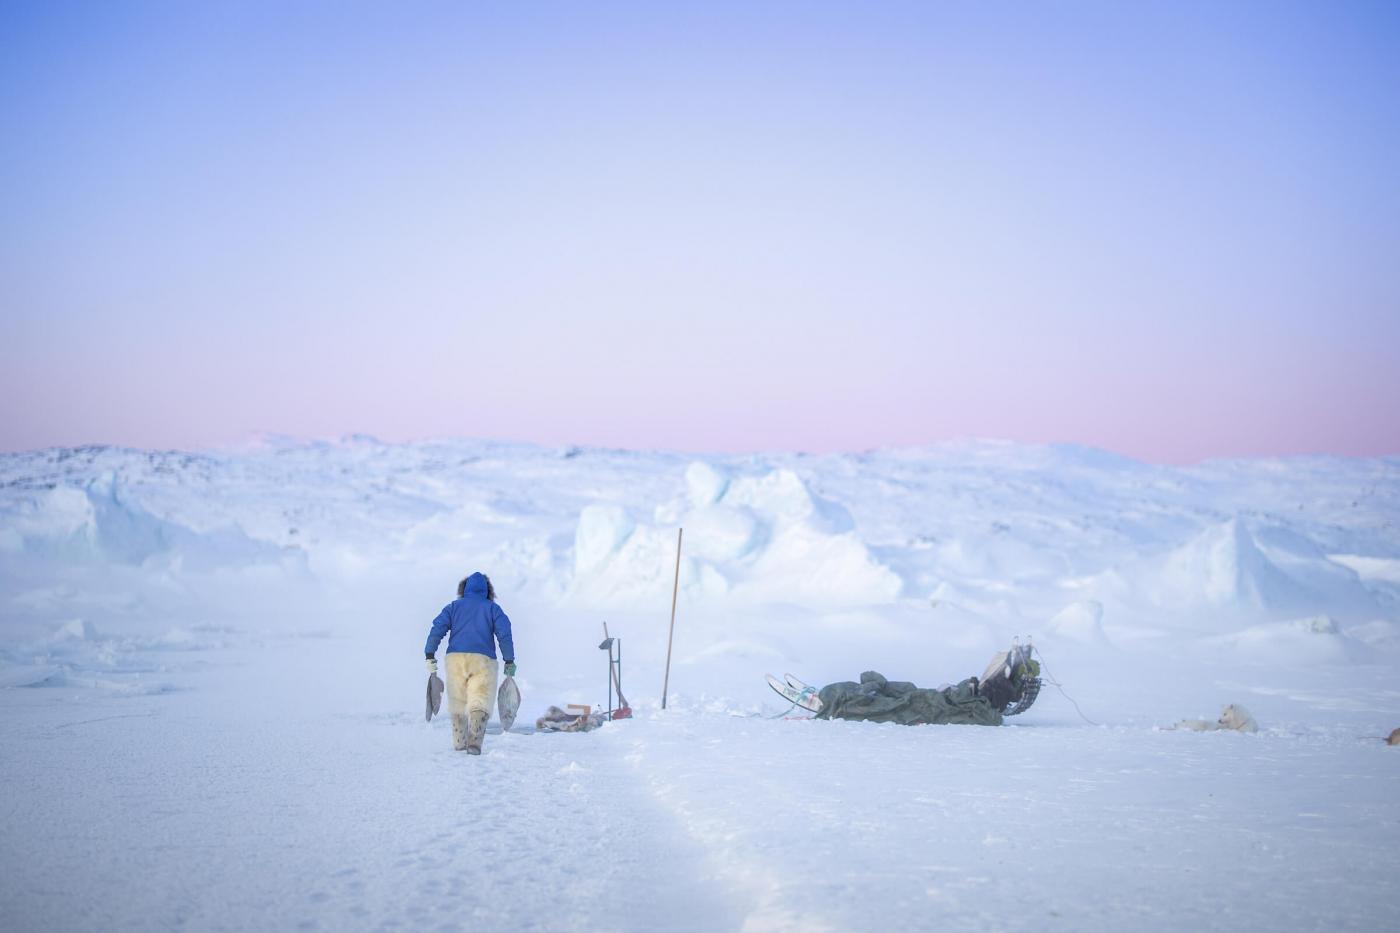 Fishing spot near Ilulissat. Photo - Aningaaq R. Carlsen, Visit Greenland